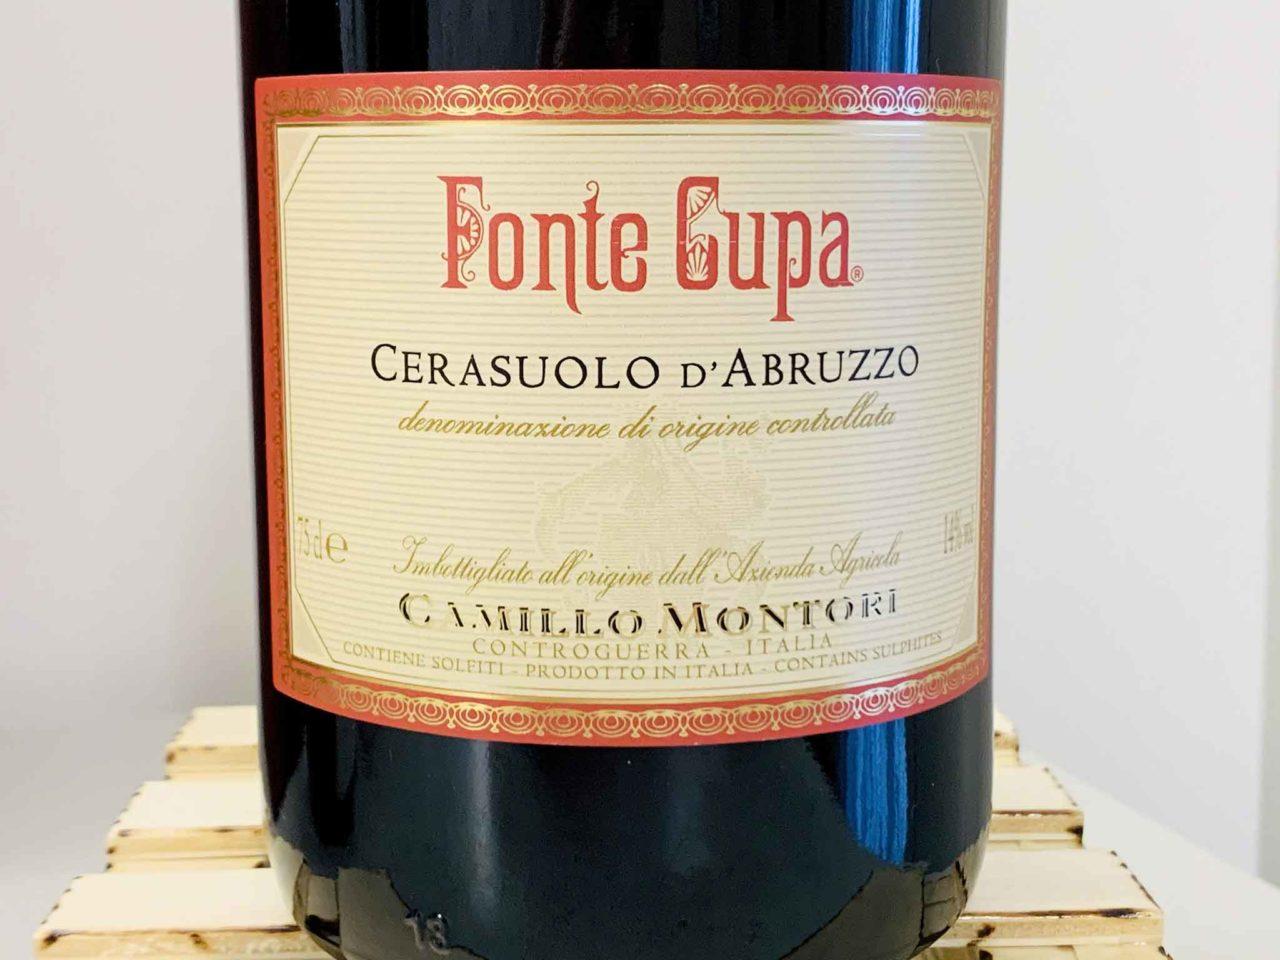 vino Fonte Cupa